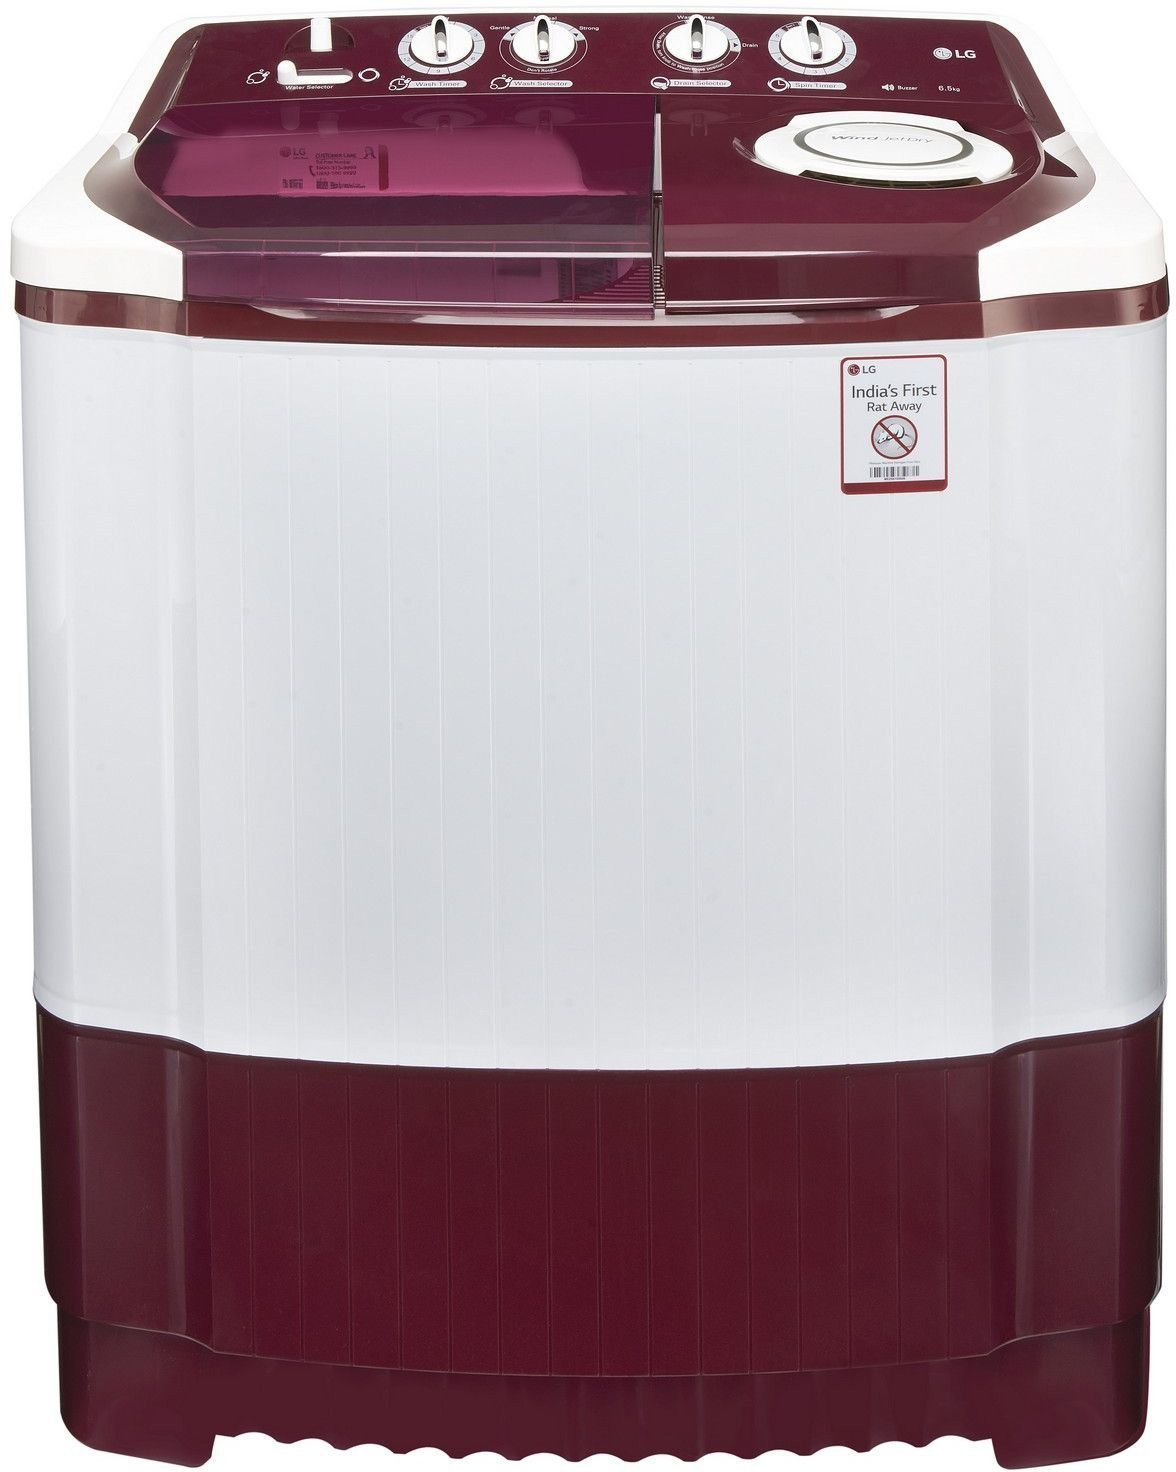 LG 6.5 kg Semi Automatic Top Load Washing Machine (P7559R3FA) Image